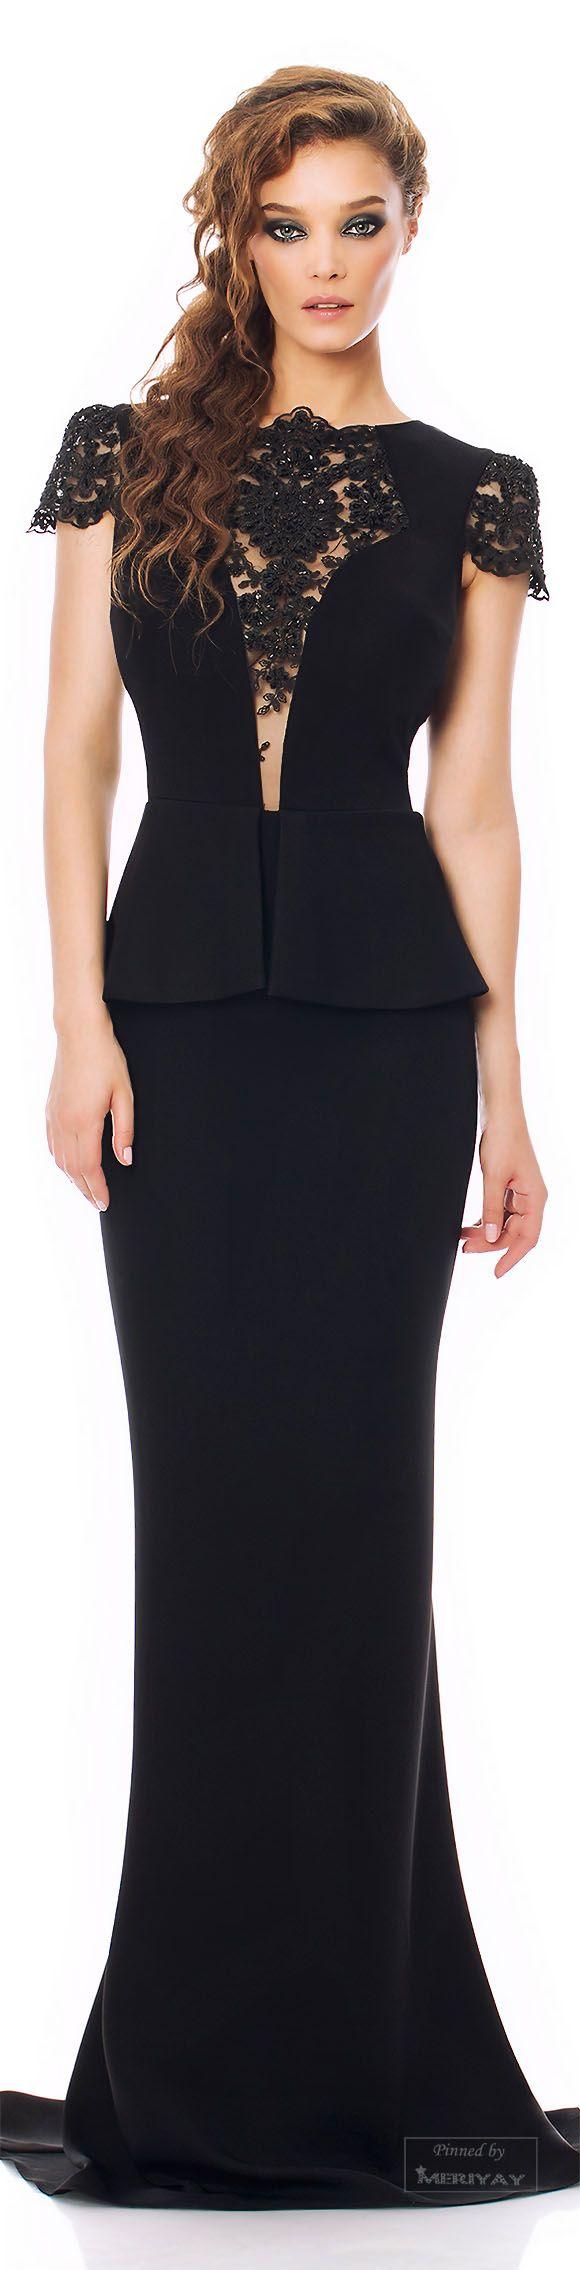 Best 25 Black Tie Gown Ideas On Pinterest Black Tie